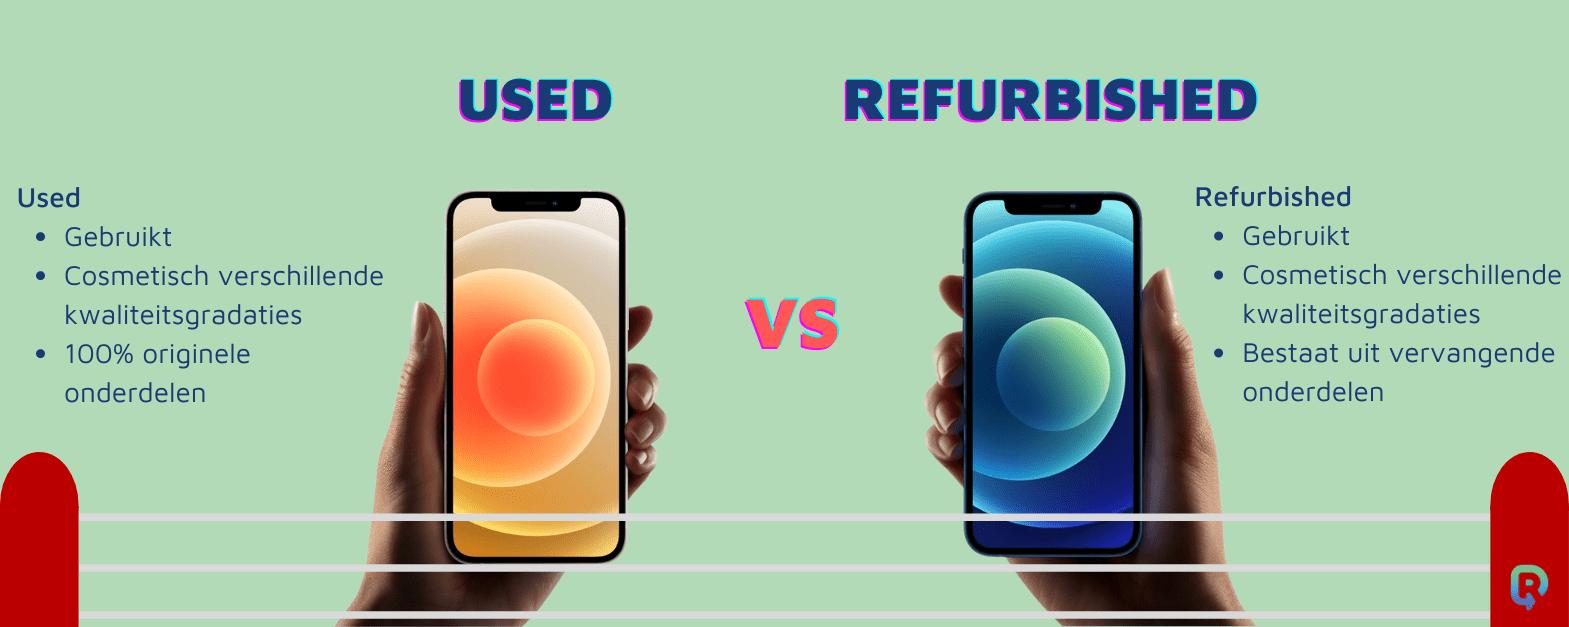 Verschil used vs refurbished